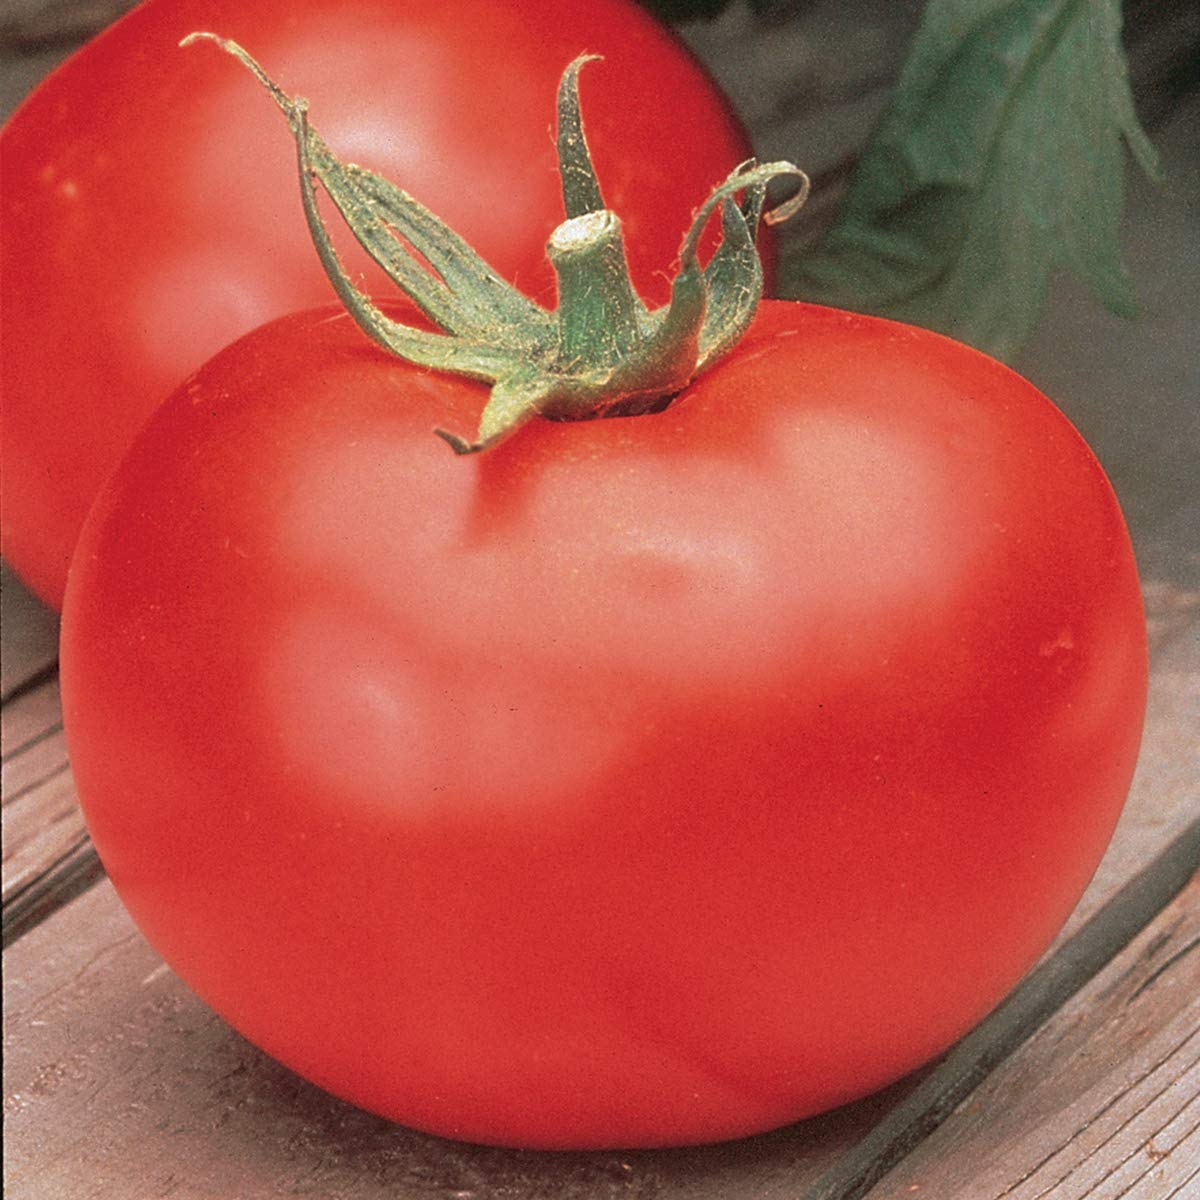 Burpee Better Boy' Hybrid Large Slicing Red Tomato, 3 Live Plants | 2 1/2'' Pot